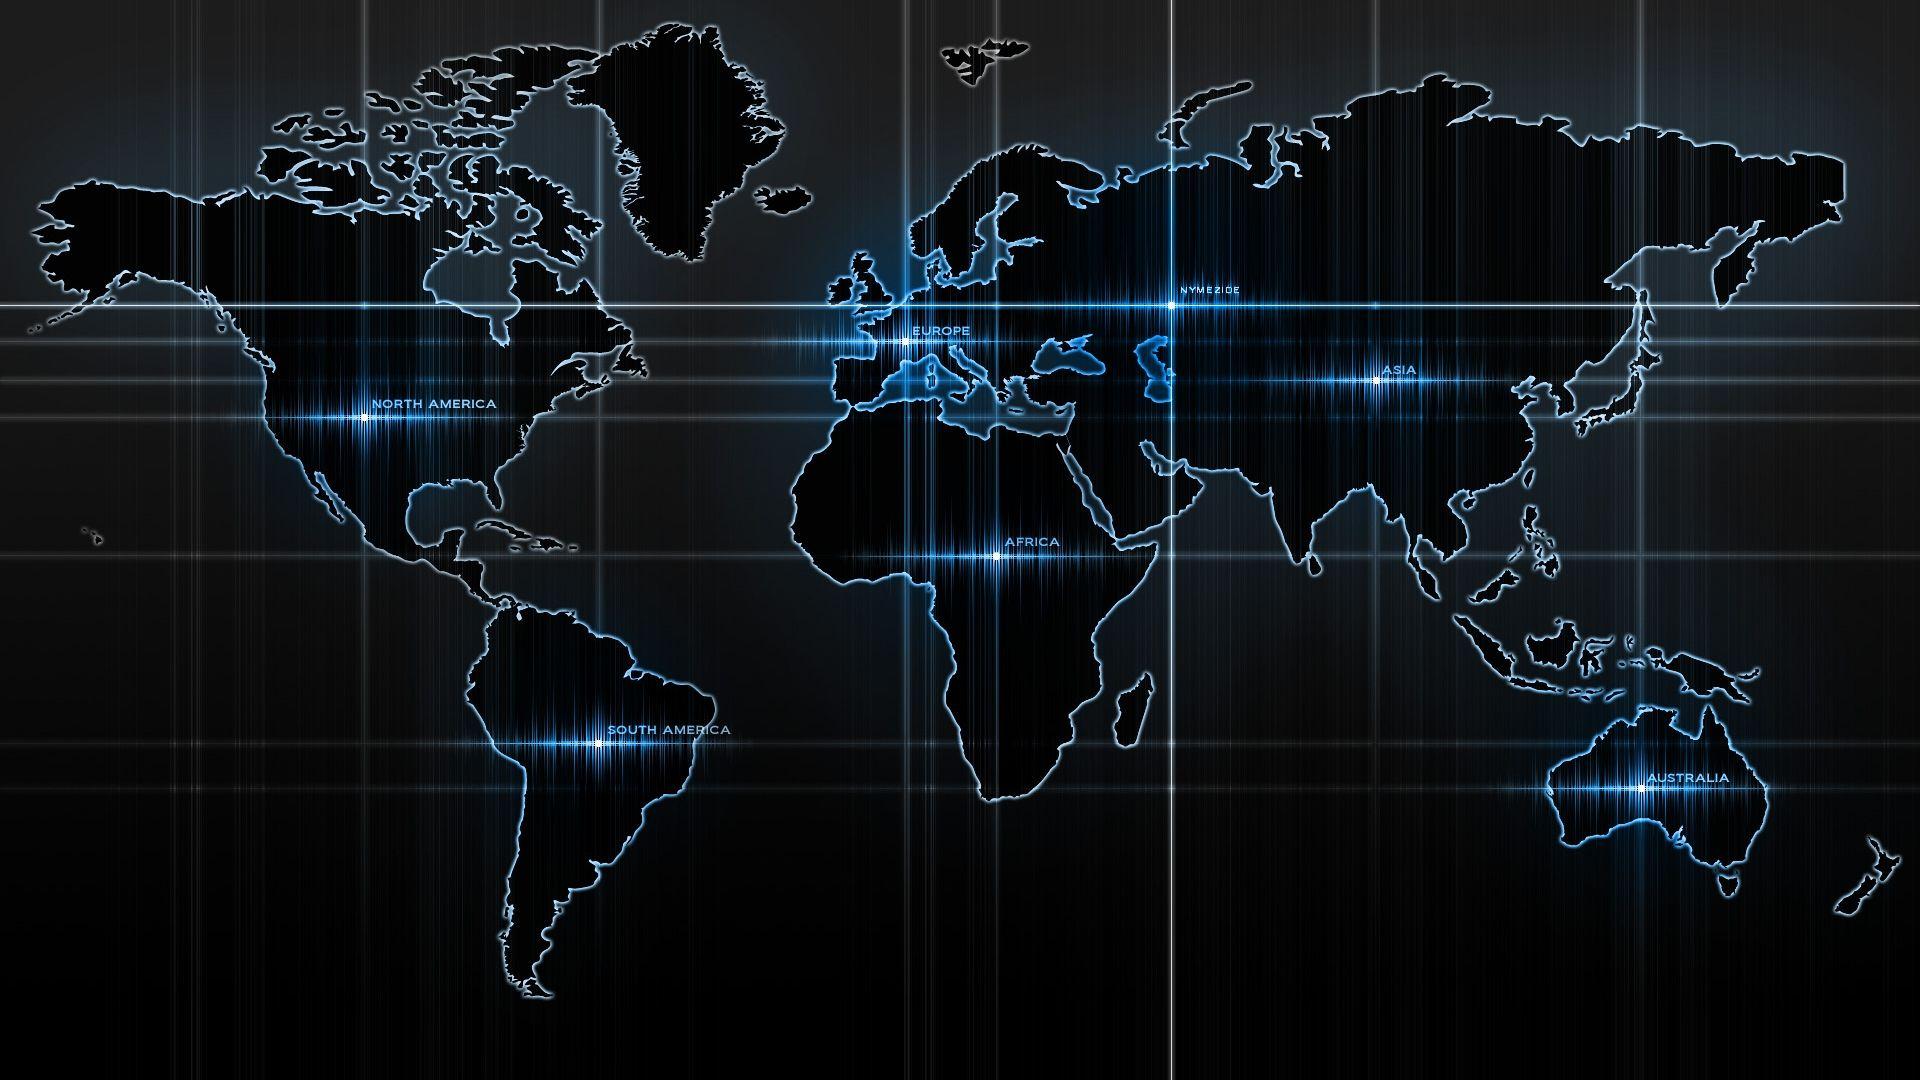 widescreen computer wallpaper a· word maphigh resolution